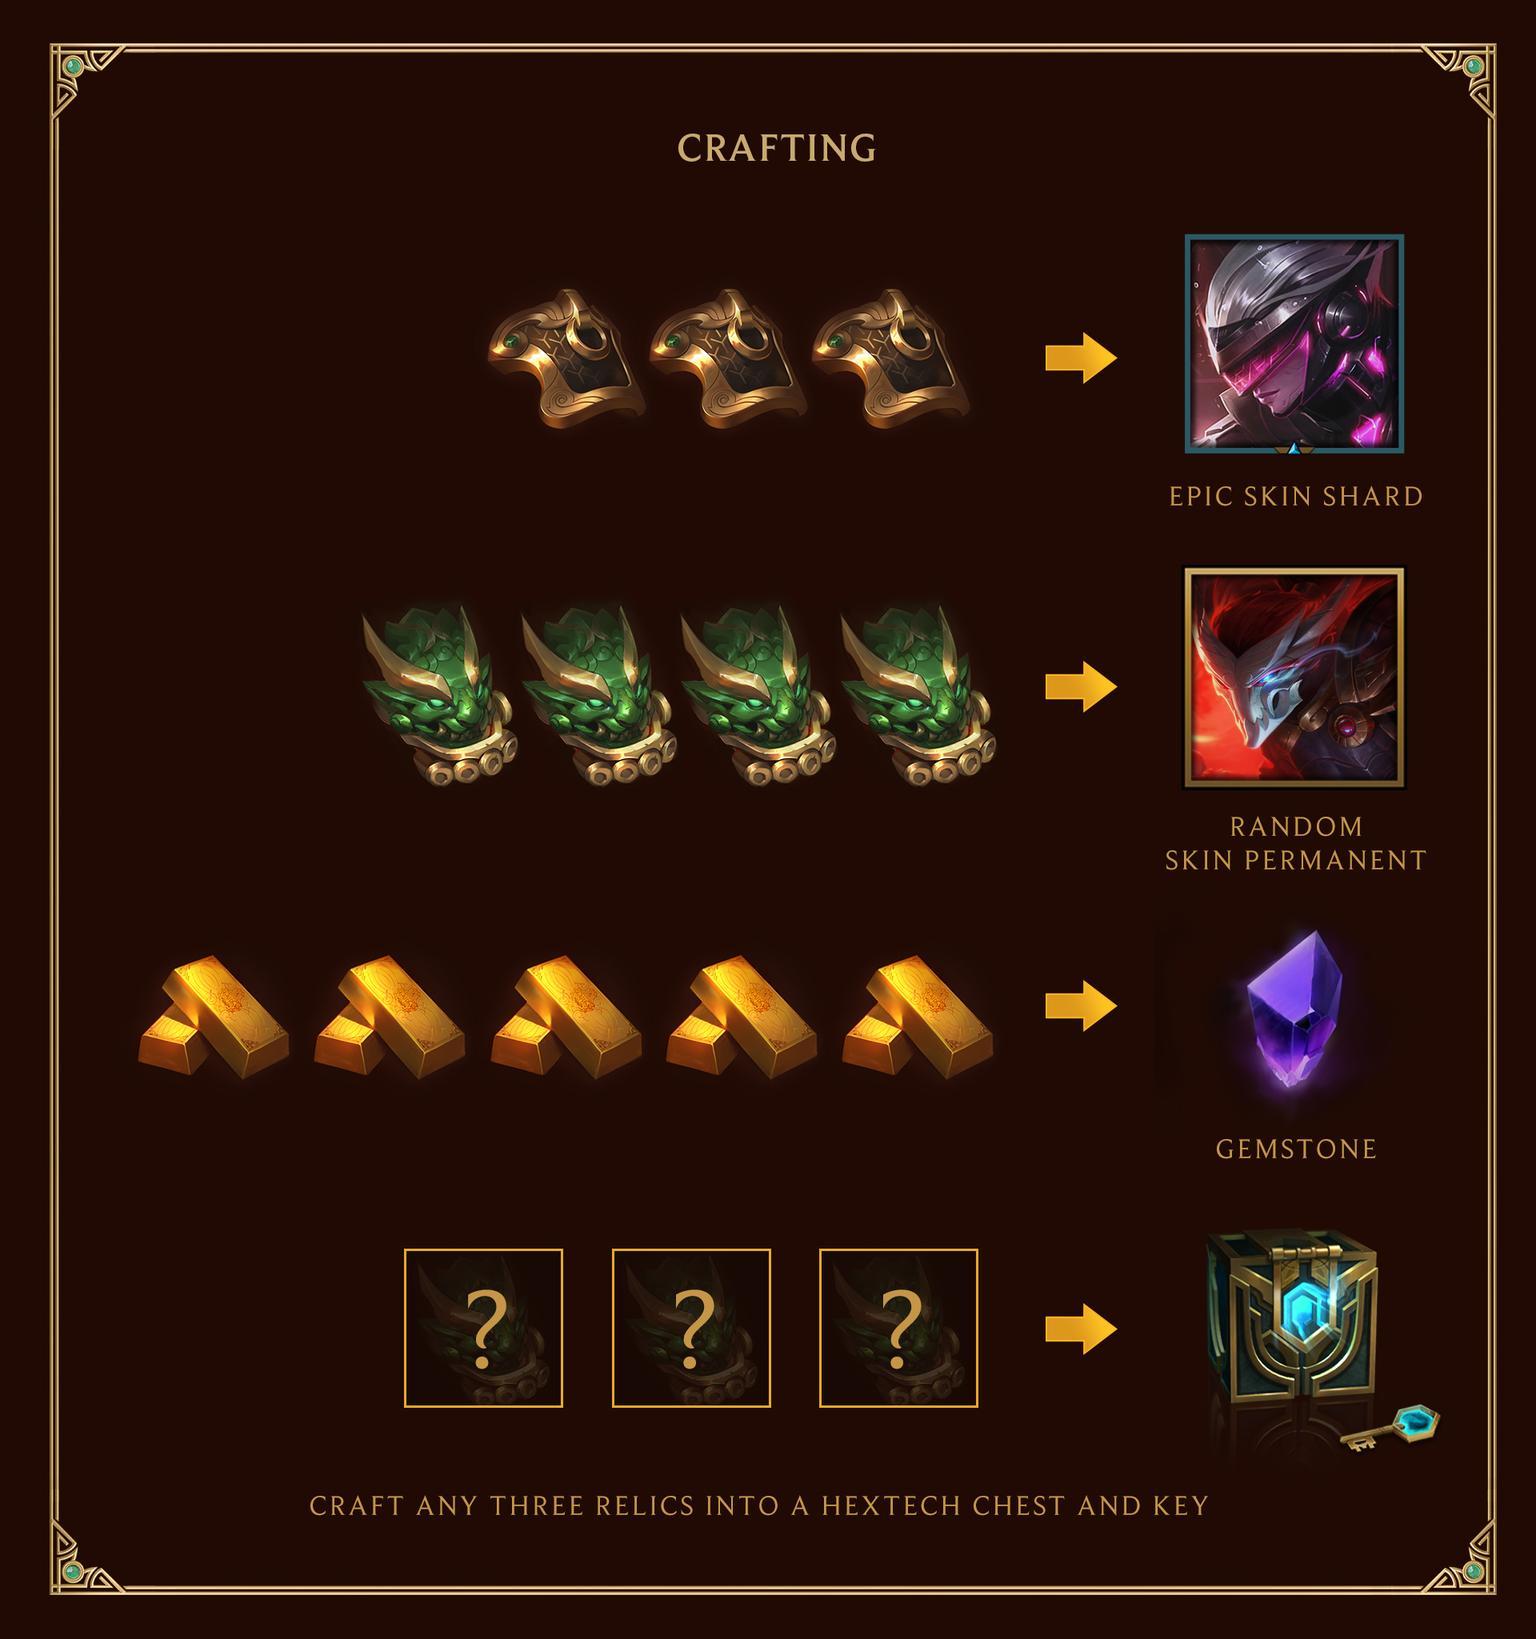 lol how to get gemstones